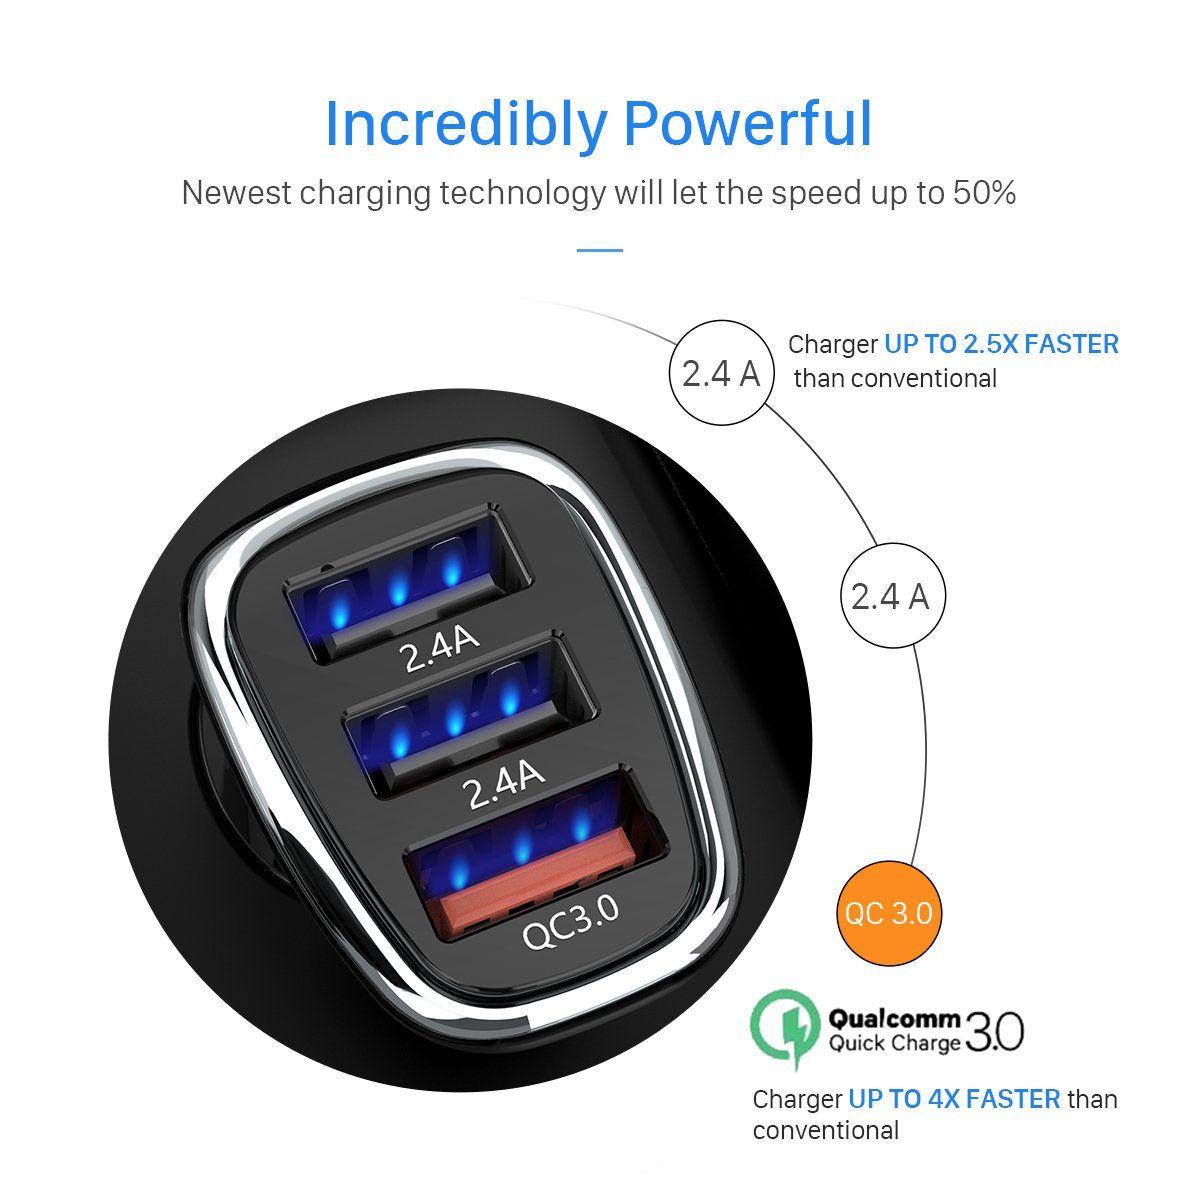 medium resolution of qc3 0 usb car charger 3 port divi usb car adapter qc3 0 quick charging metal for iphone x 8 7 6s plus ipad air 2 mini 3 galaxy